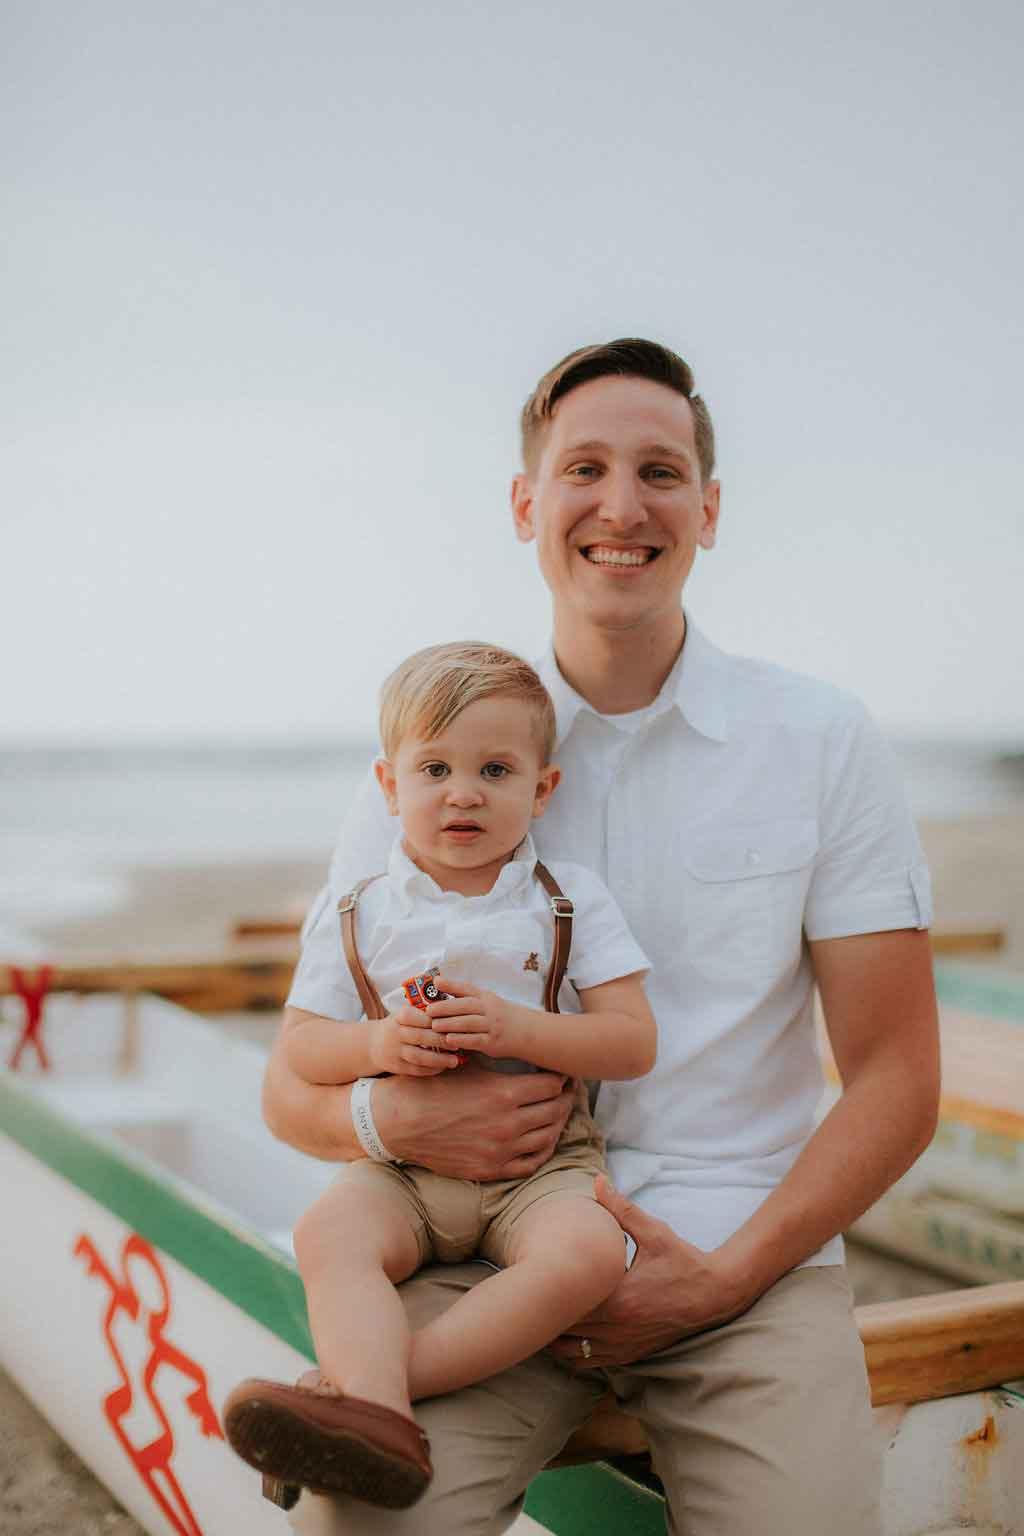 Make Lifelong Memories! Family Vacation In Hawaii